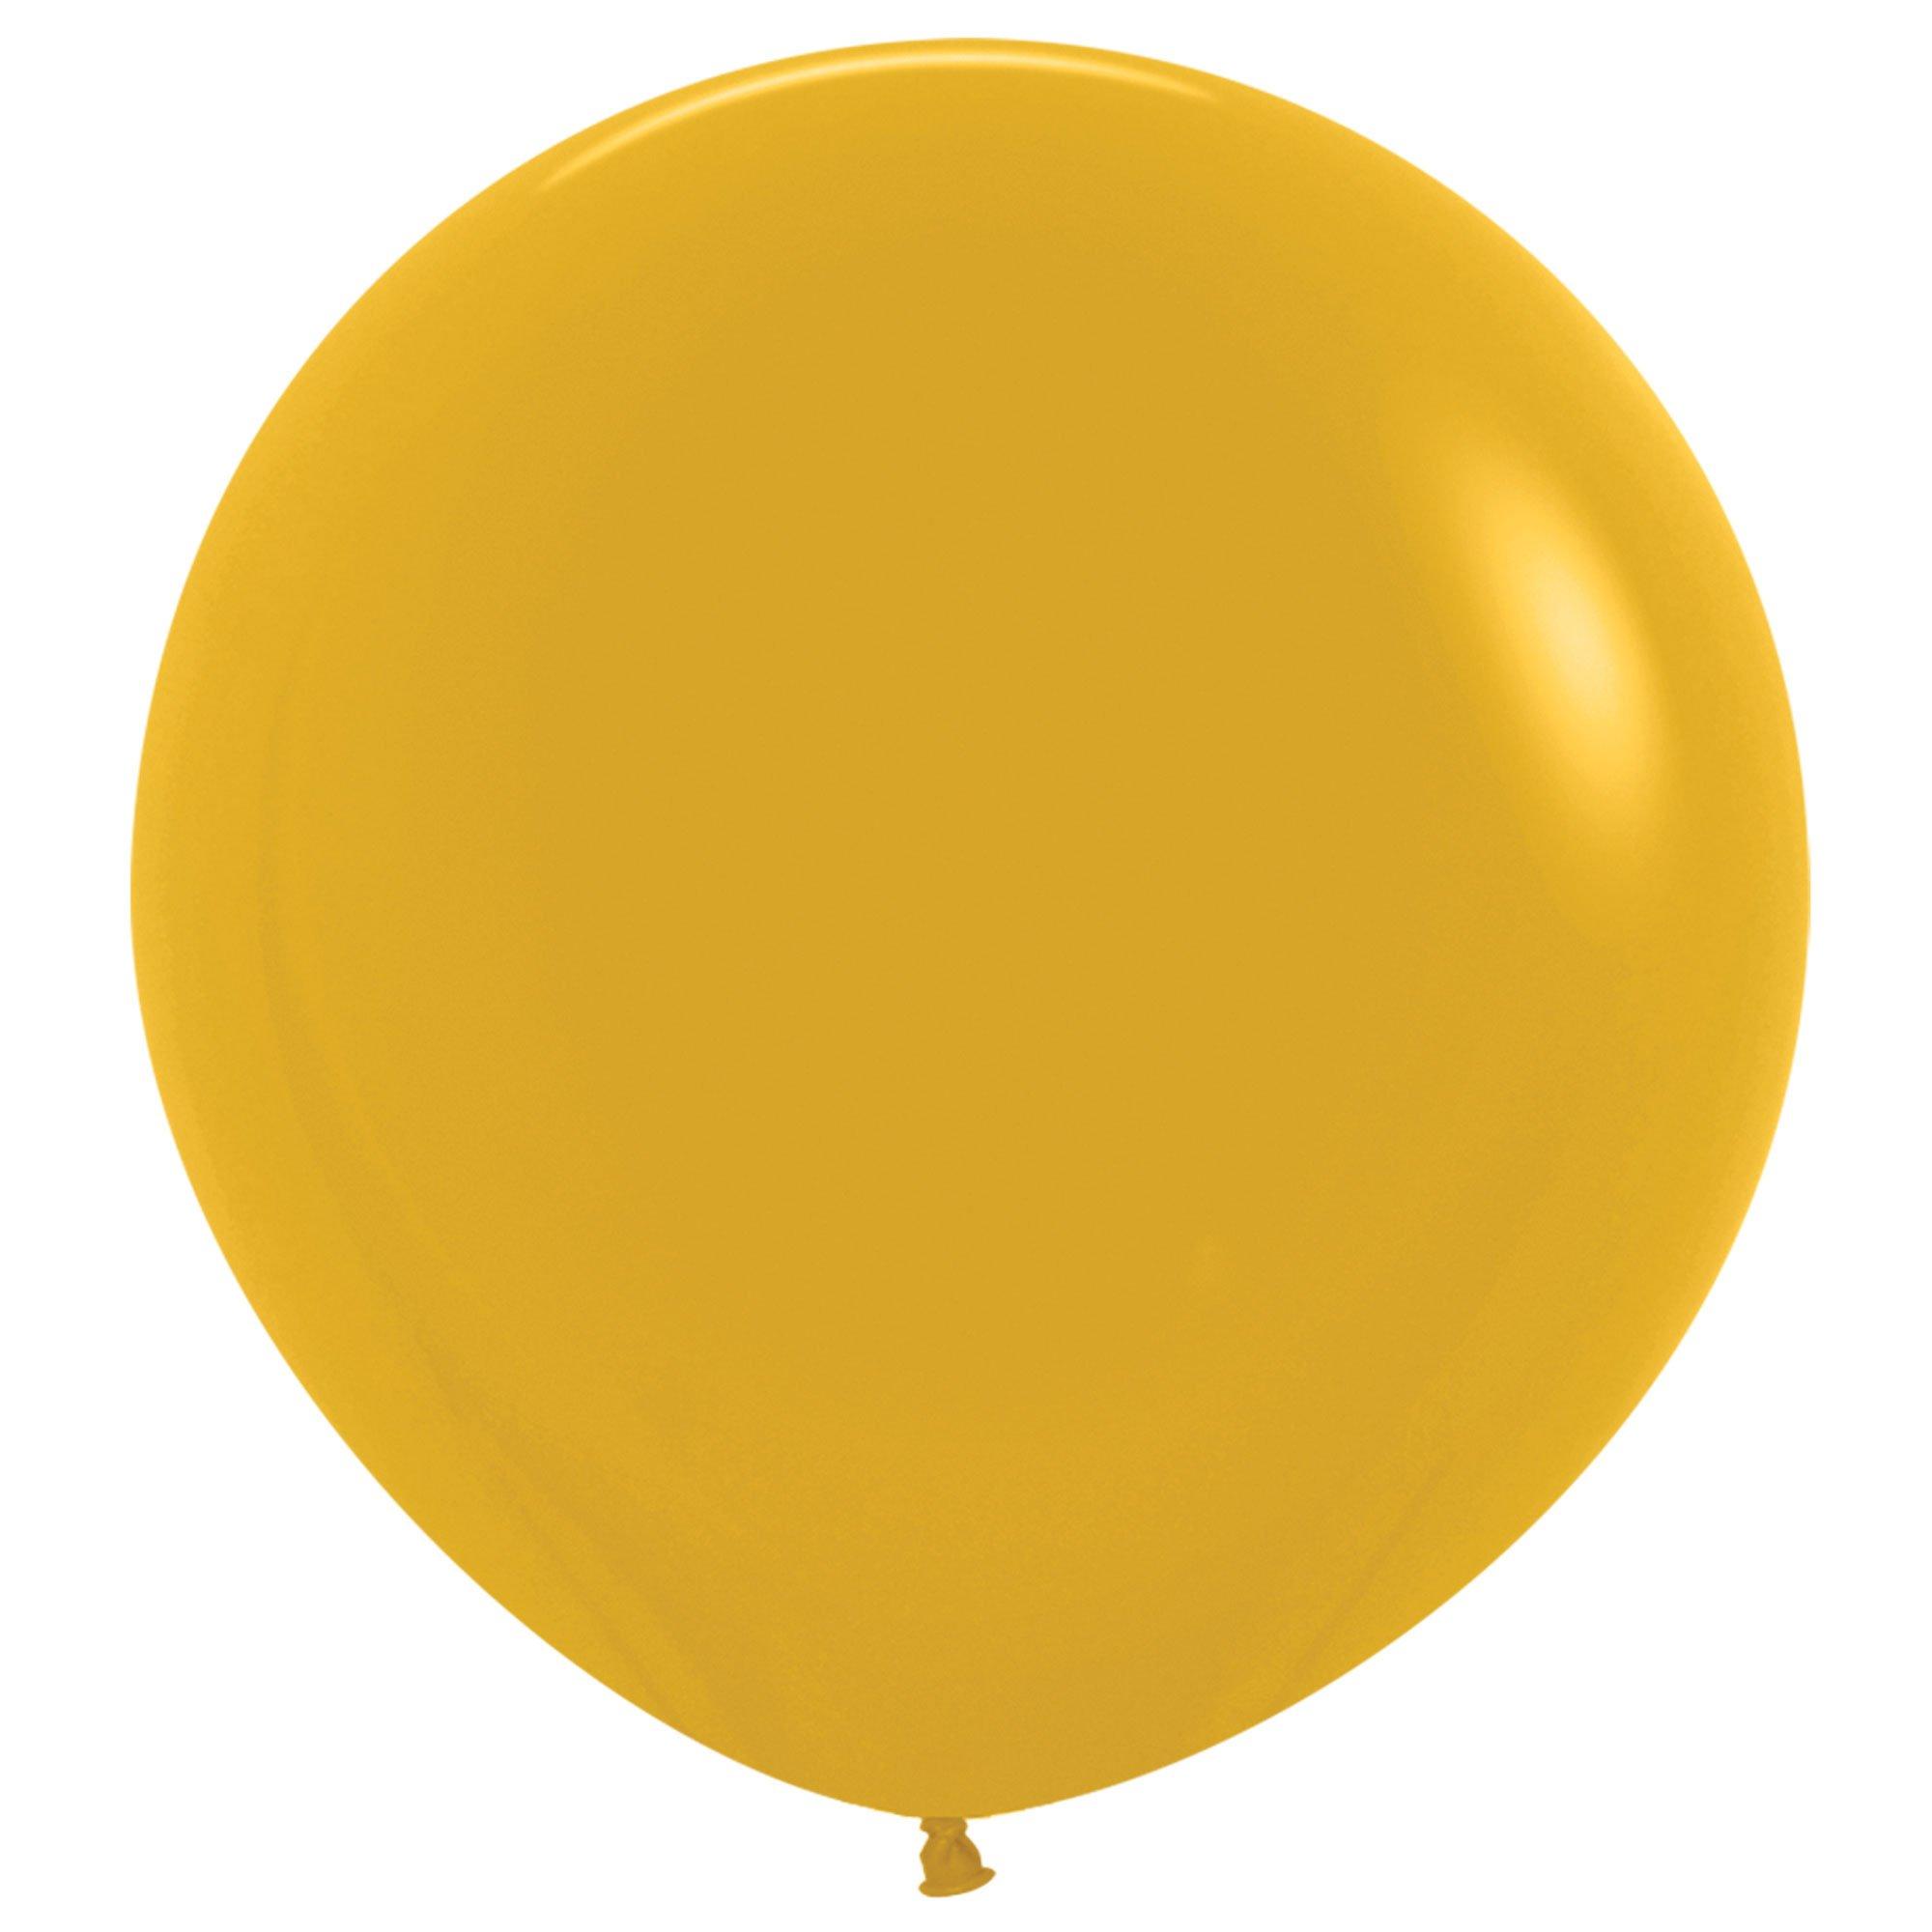 Sempertex 60cm Fashion Mustard 023, 3PK